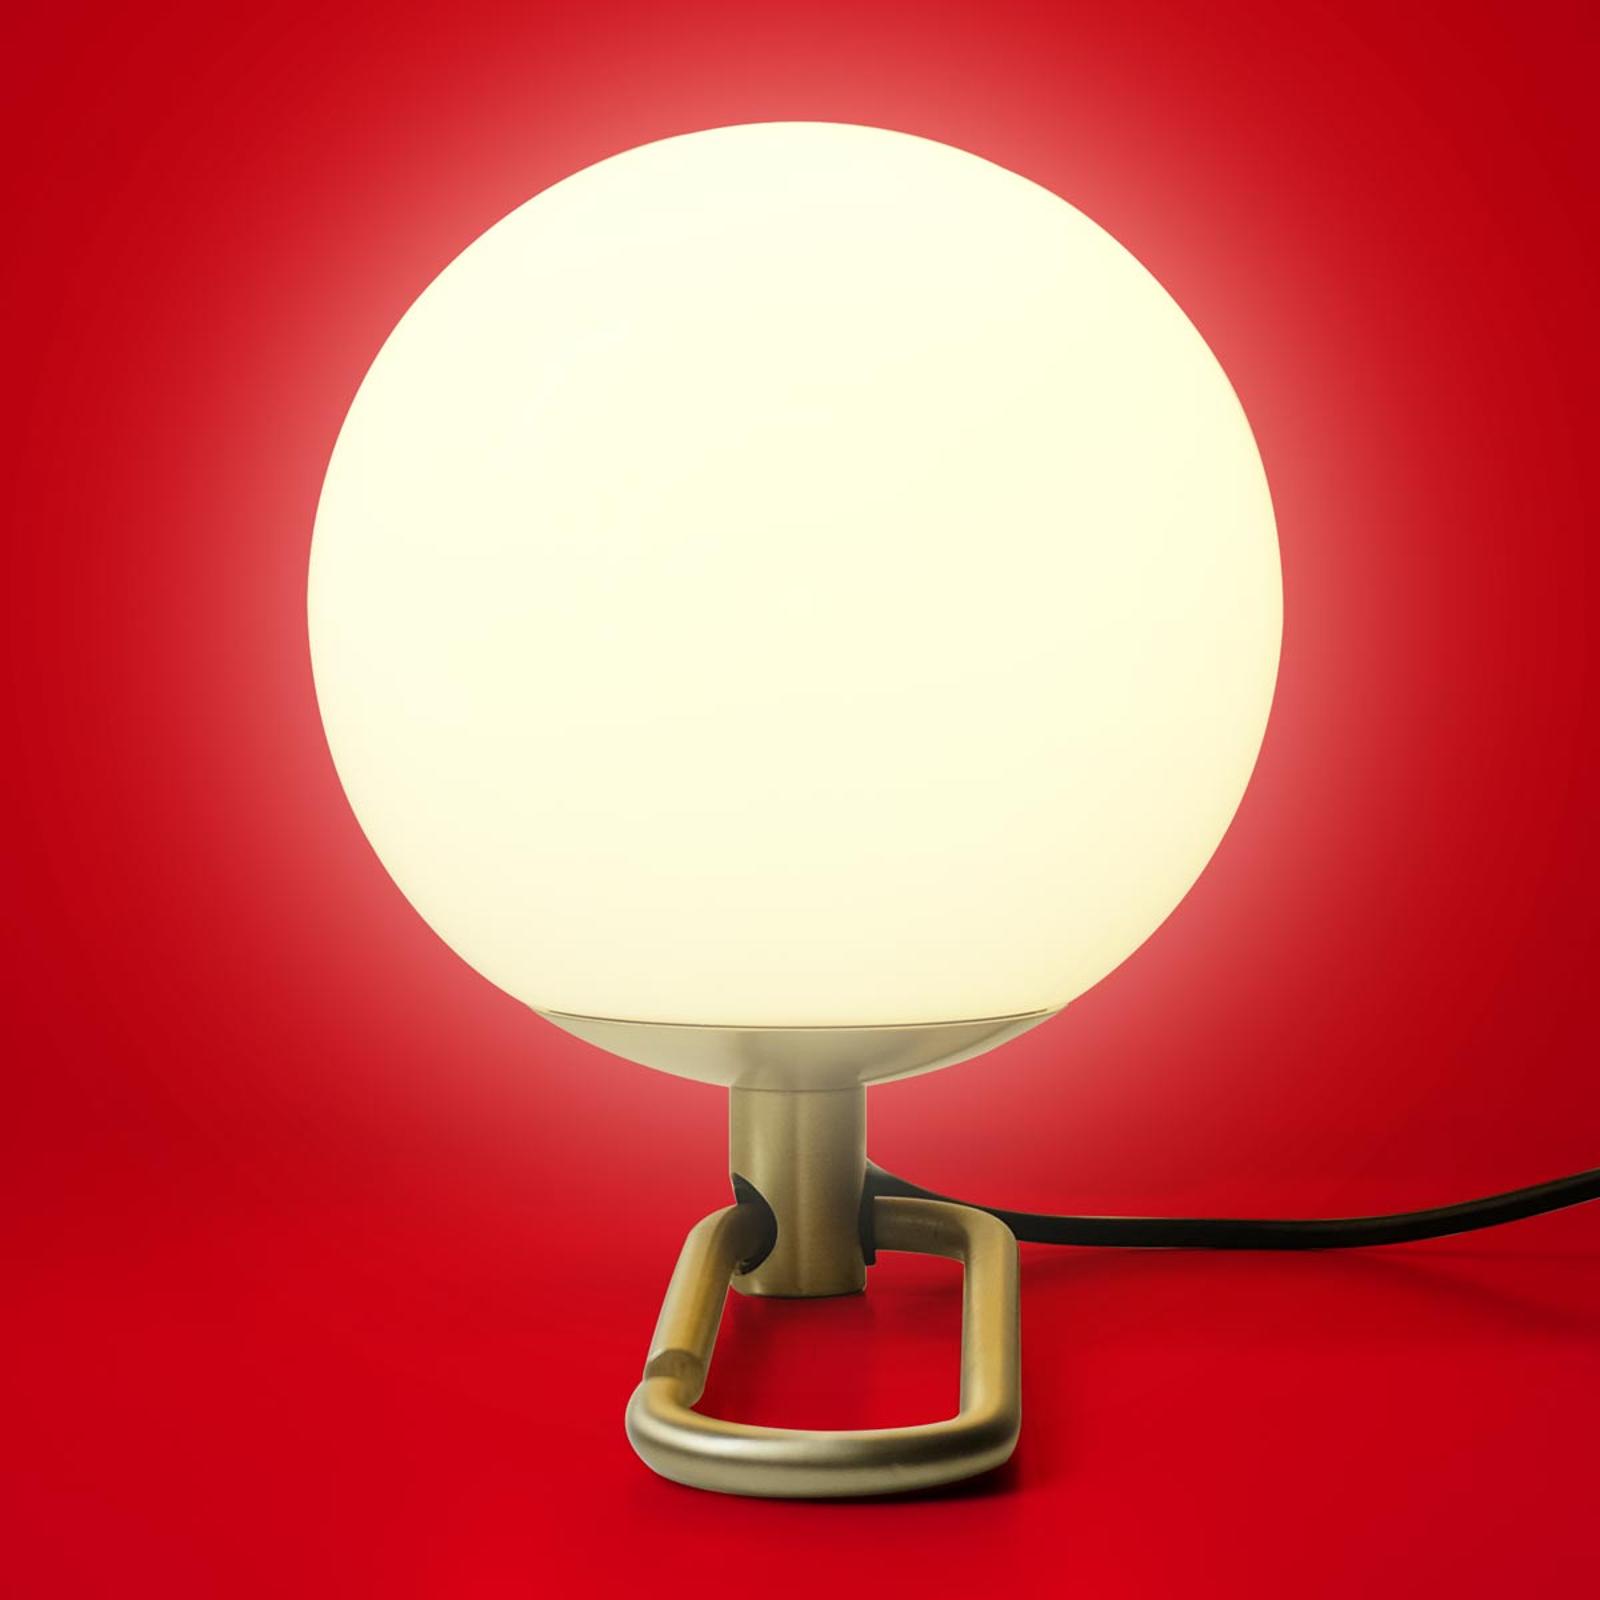 Lampe à poser LED polyvalente nh1217